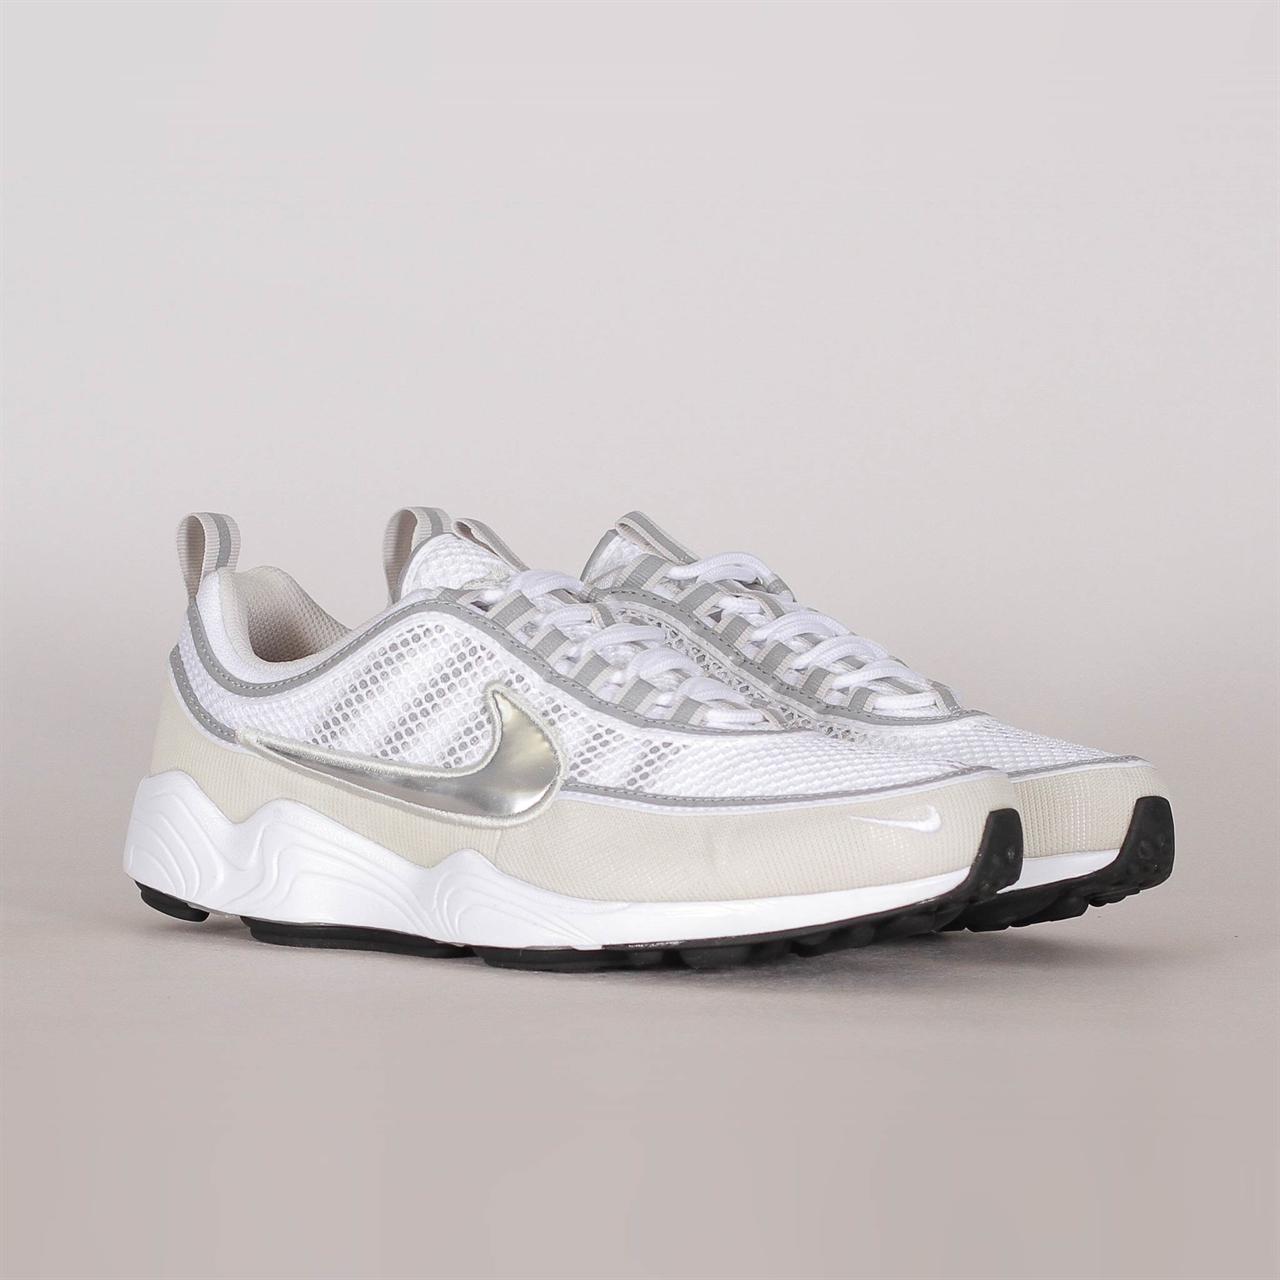 34f05044947dd Shelta - Nike Sportswear Air Zoom Spiridon  16 (926955-105)